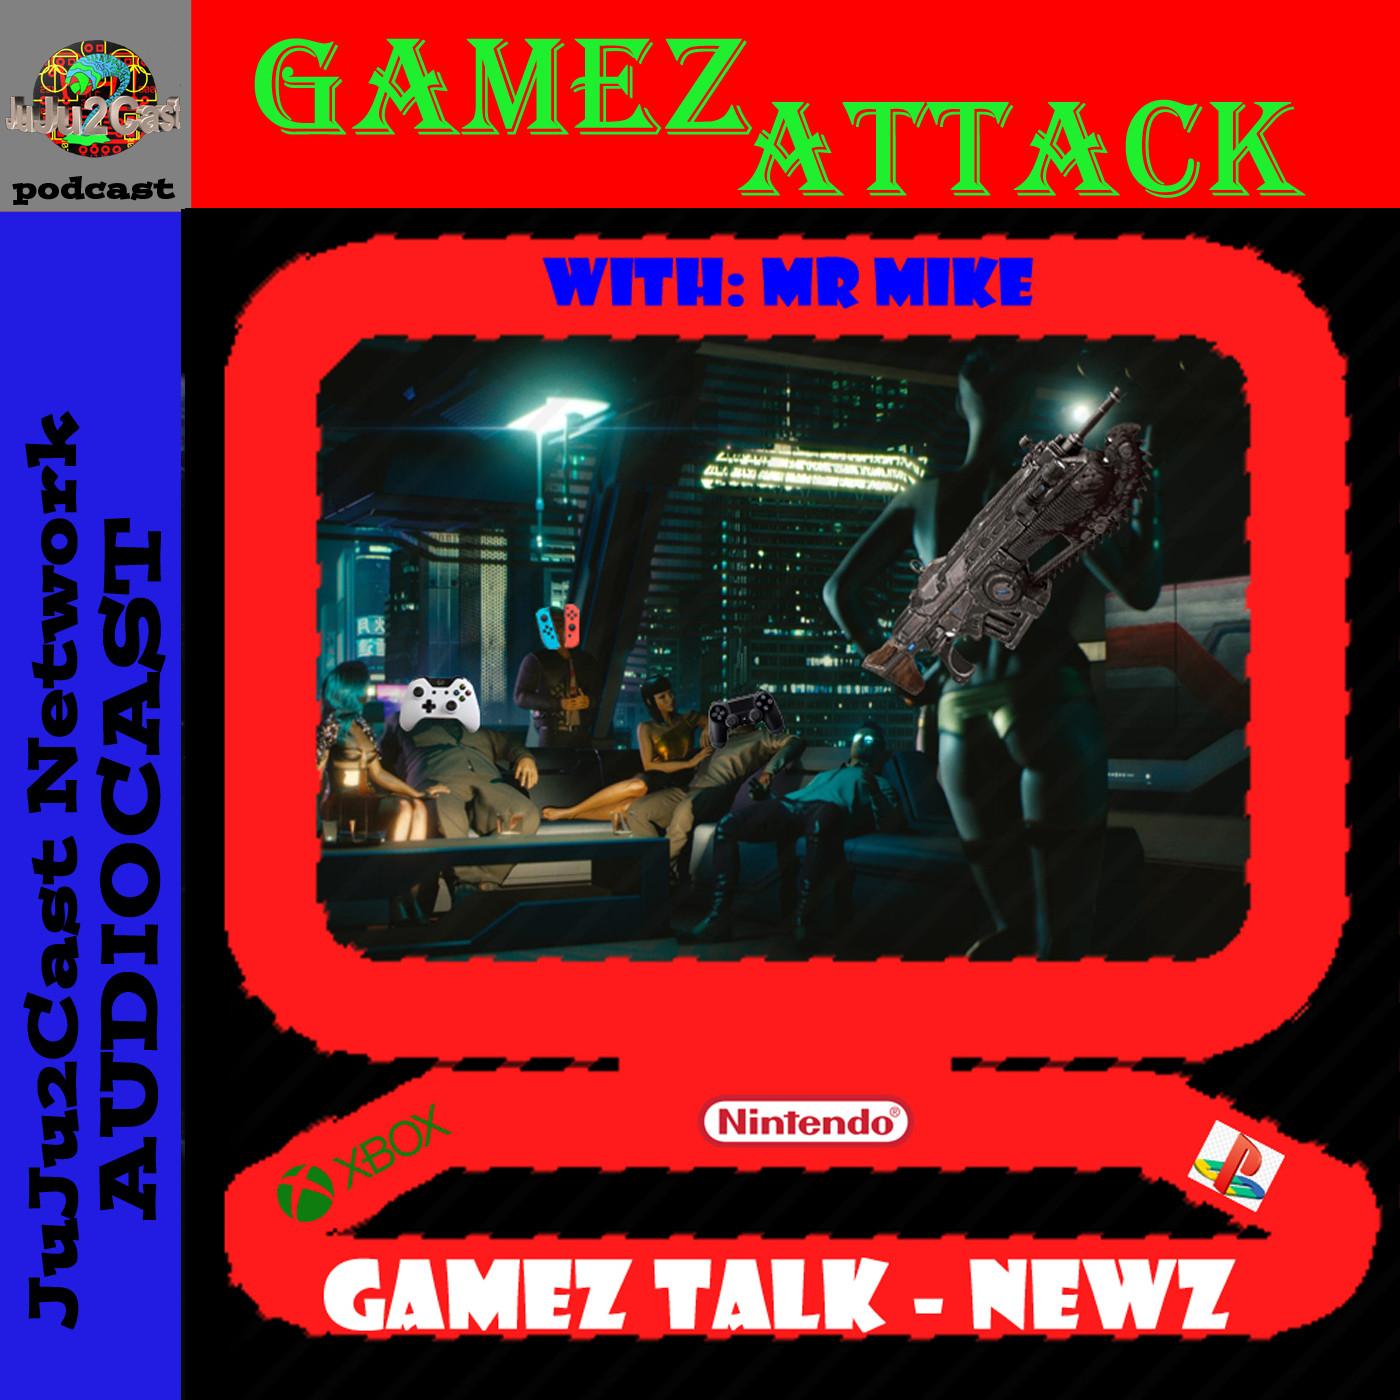 GamezAttack AudioCast #388 What Games?